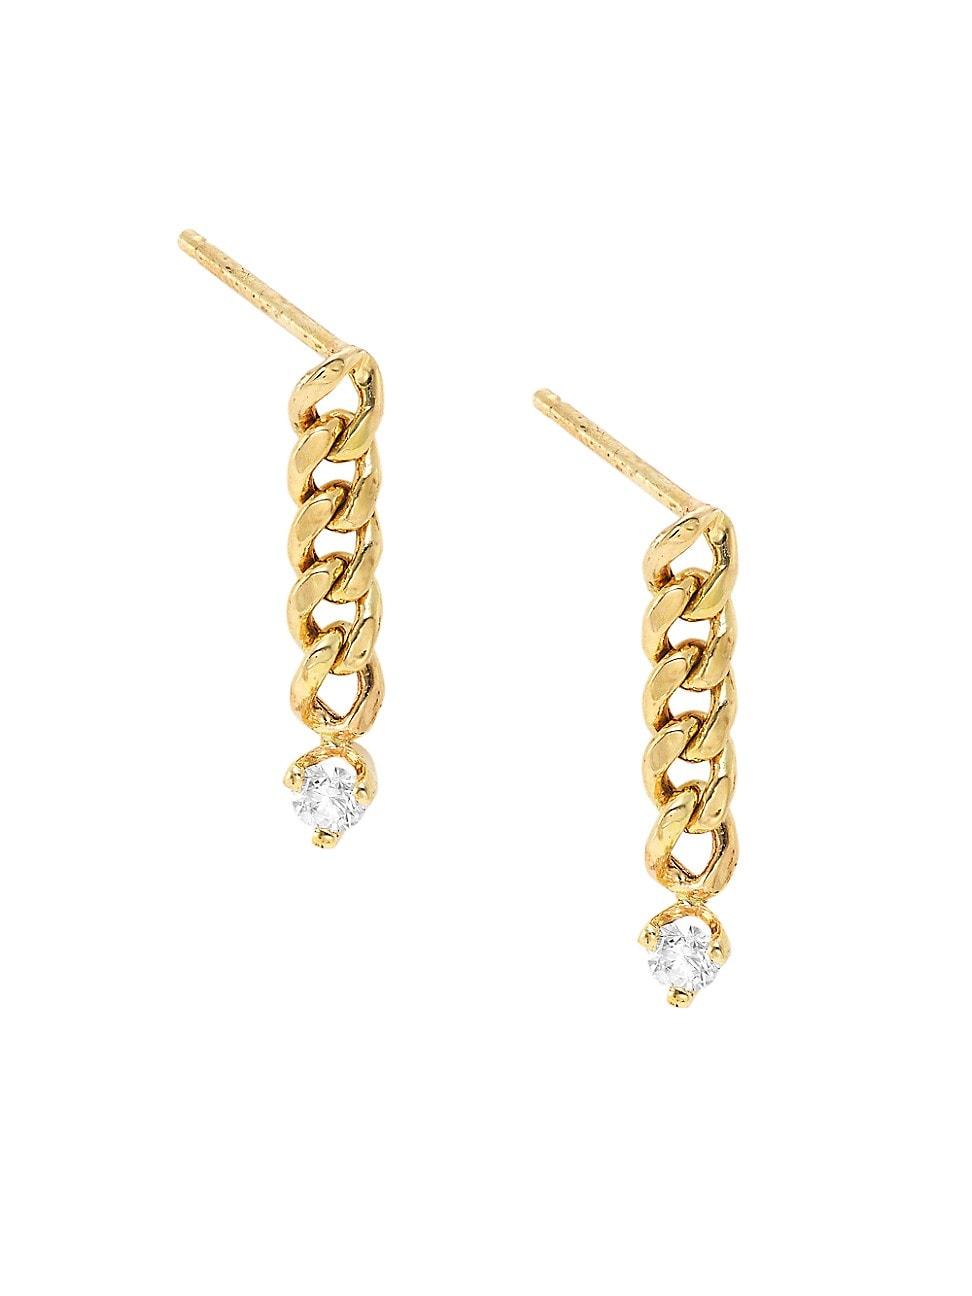 Zoë Chicco Women's 14k Yellow Gold & Diamond Small Curb Chain Drop Earrings